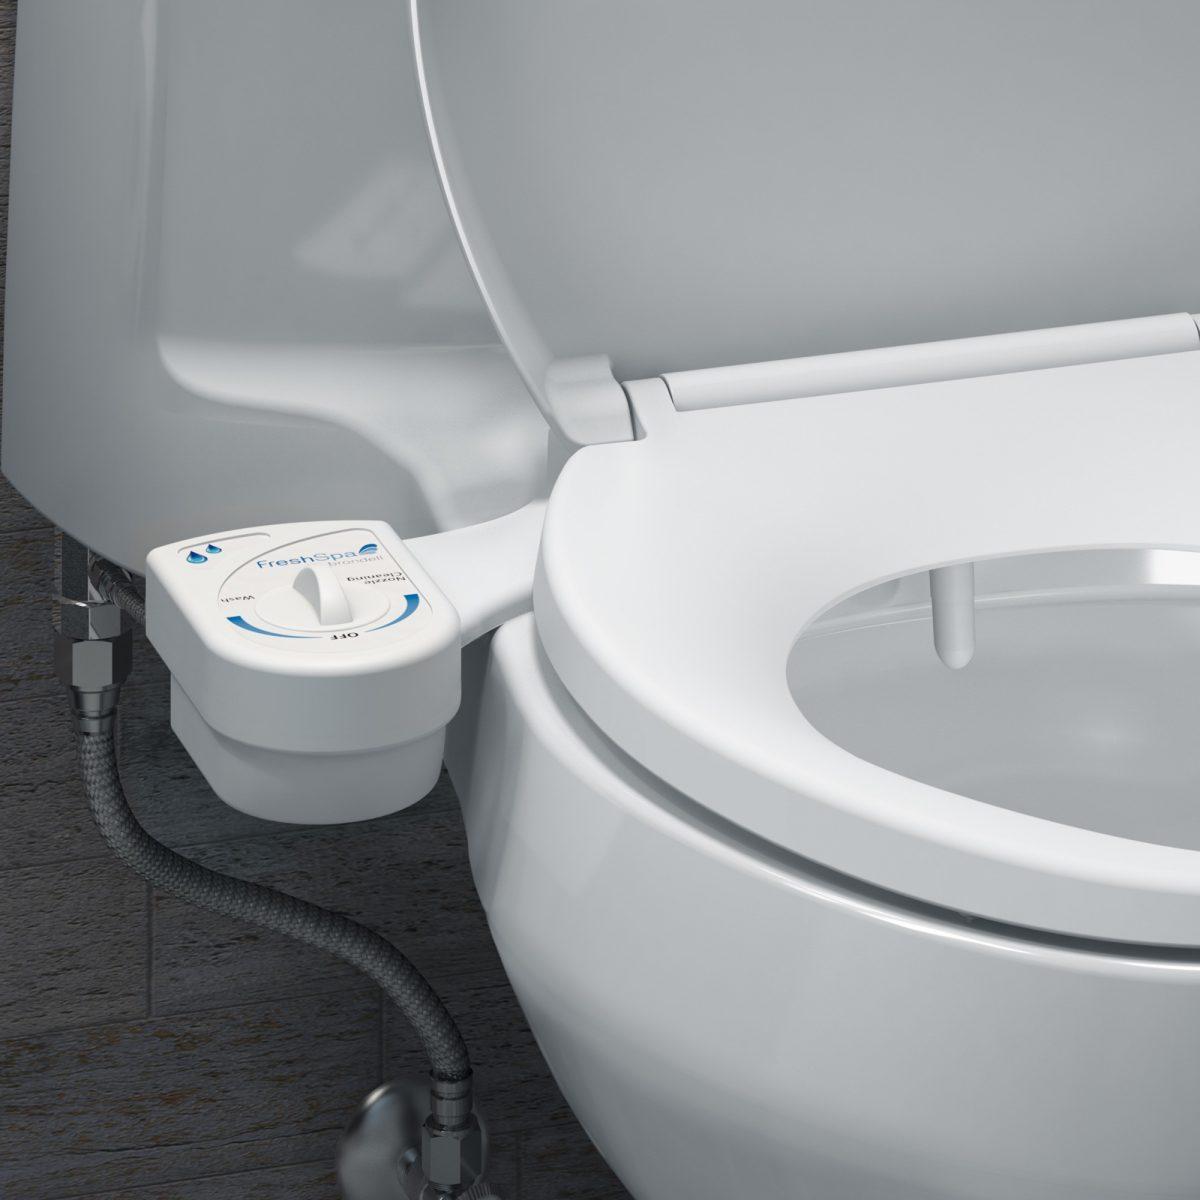 bagno-senza-bidet-sanitario-incorporato